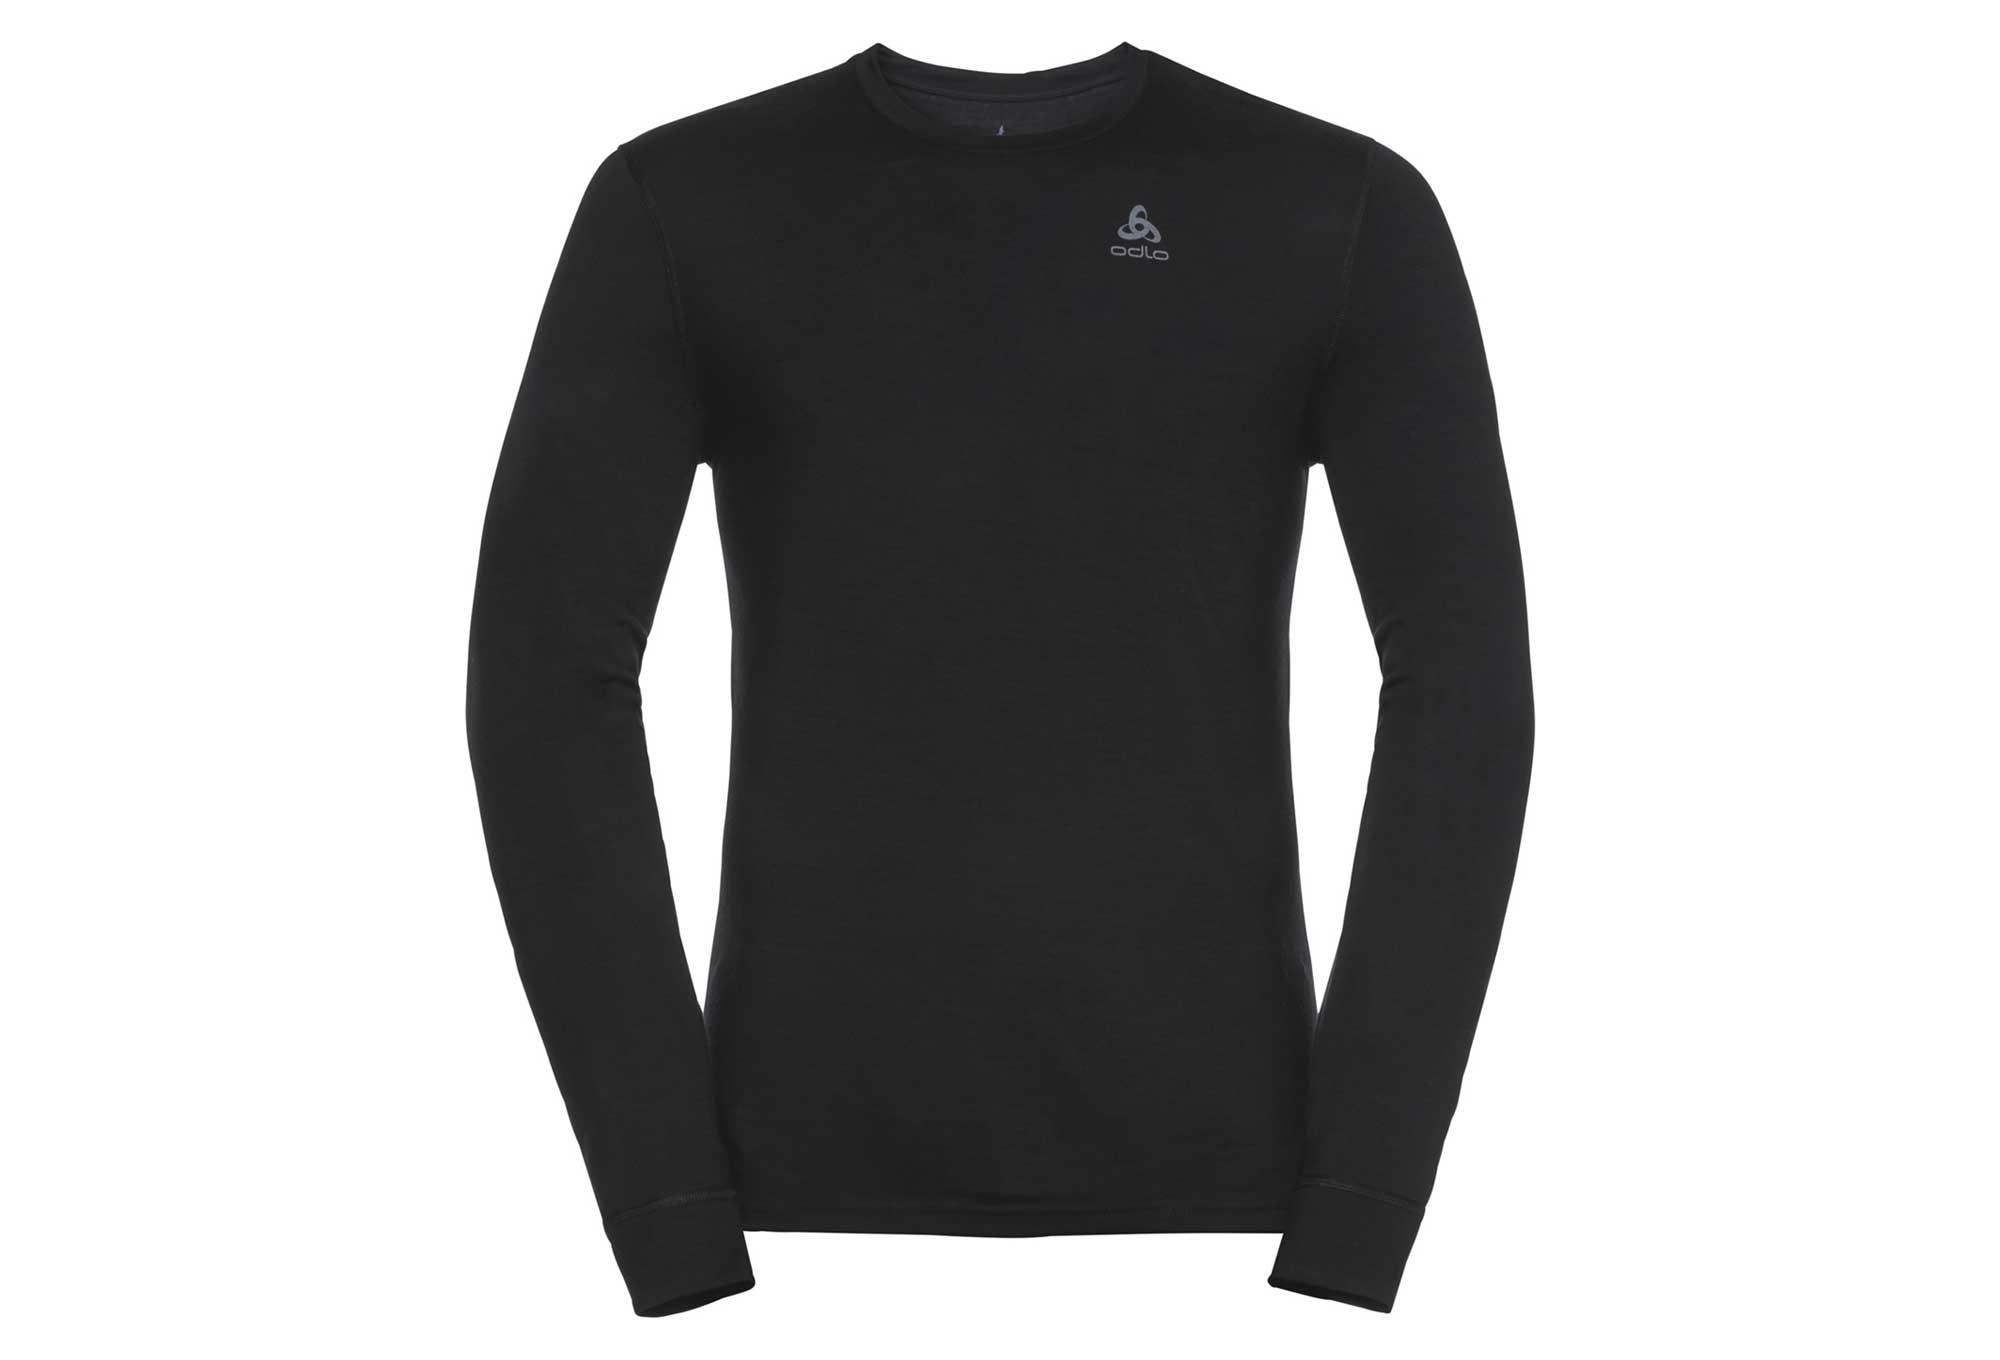 cd0106190a507 T-shirt Manches Longues Odlo NATURAL 100% MERINO Gris melange ...